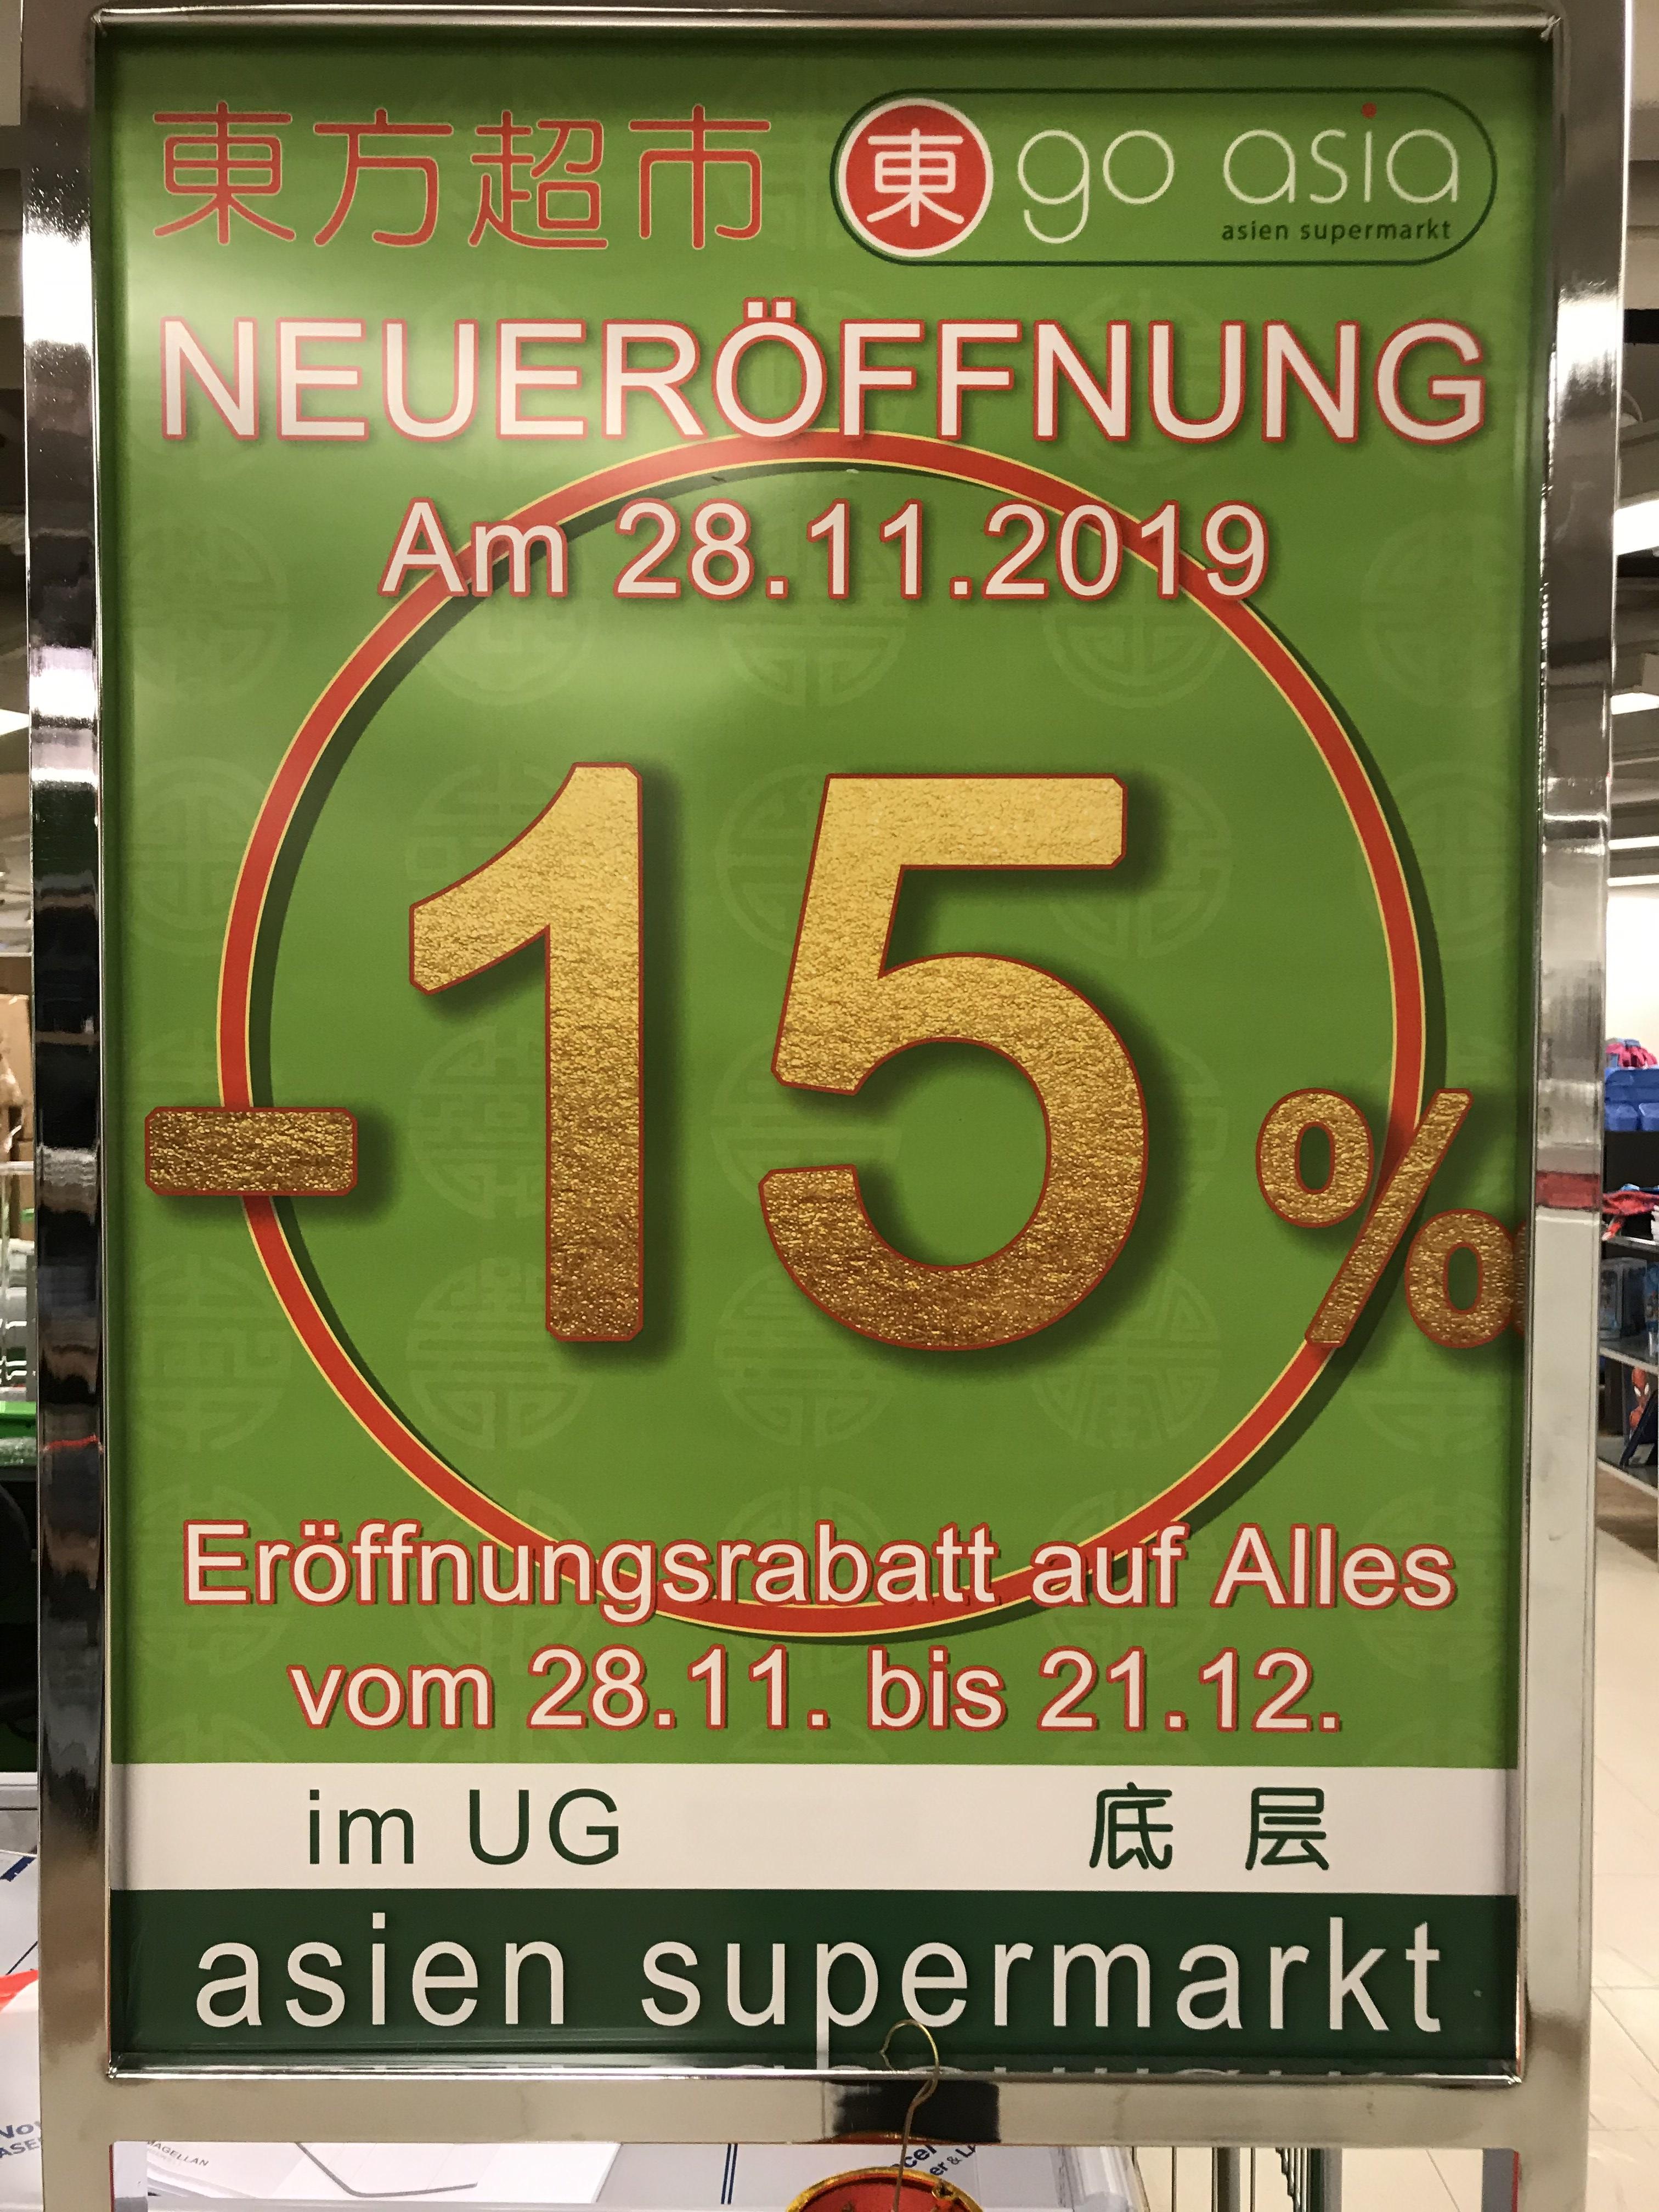 [Lokal Berlin] Go Asia Store -15% Rabatt auf alles (28.11.-21.12.)